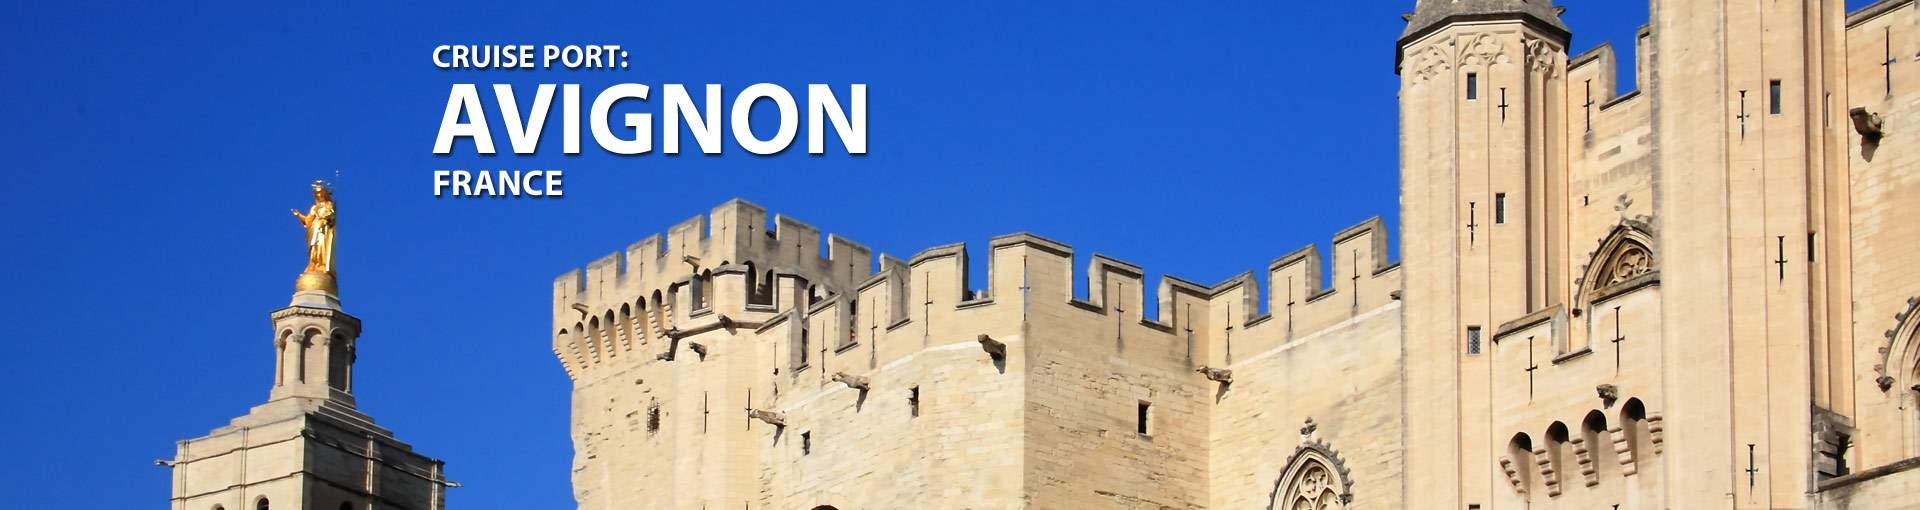 Cruises from Avignon, France